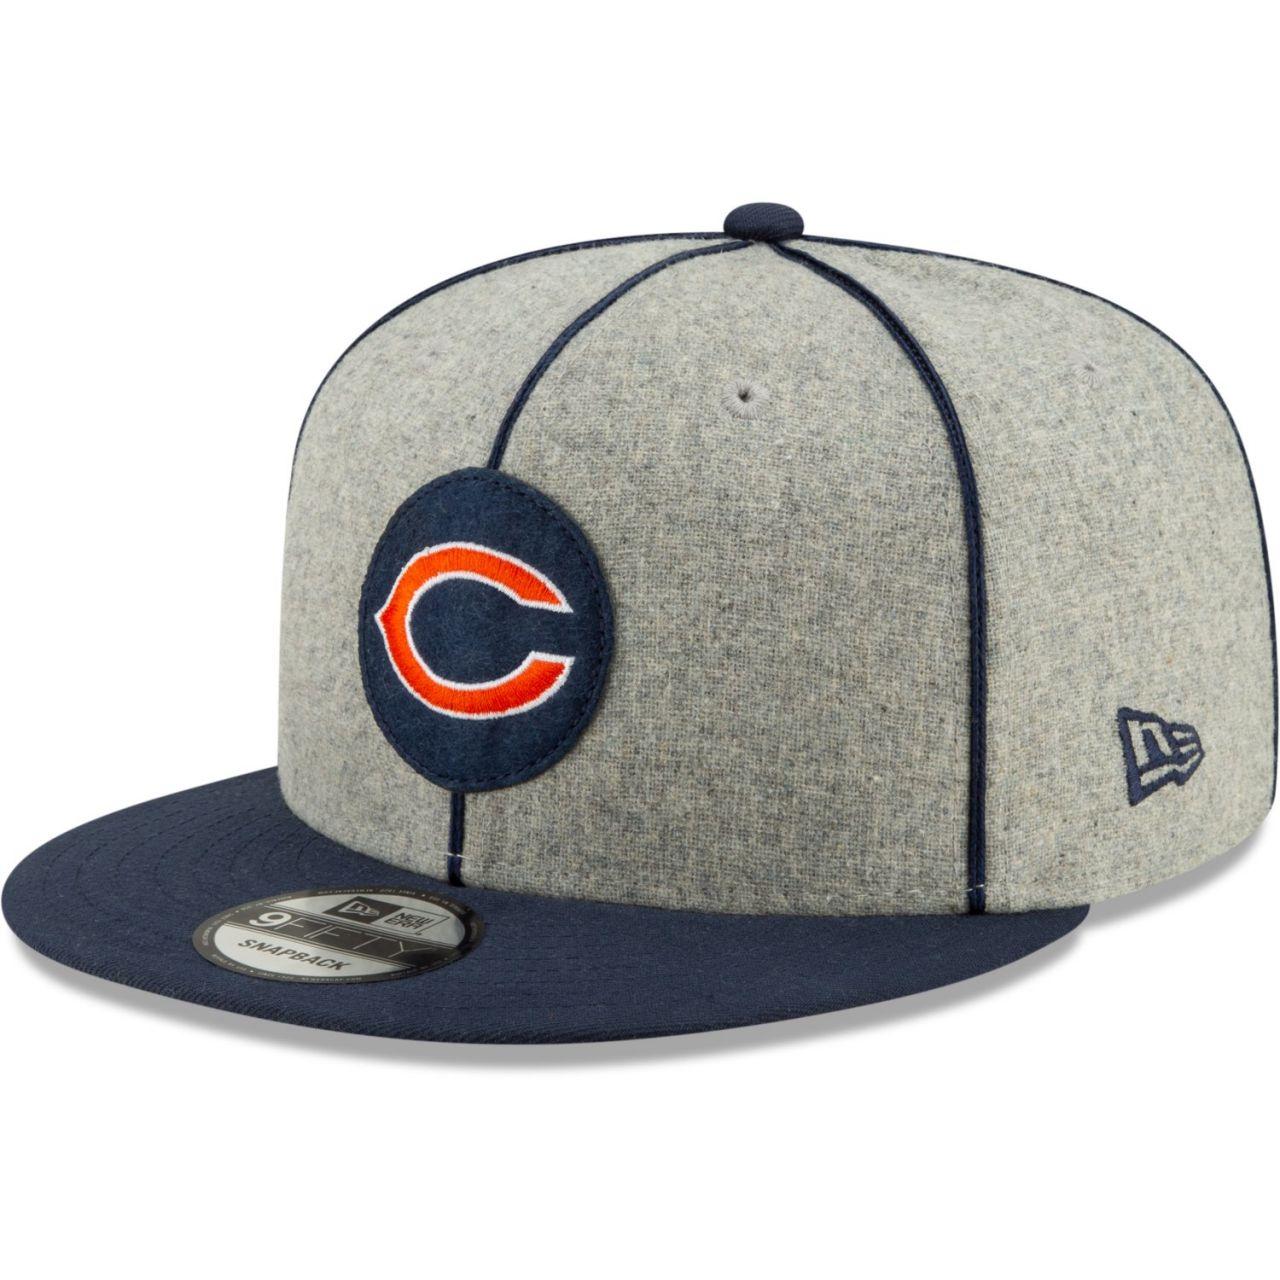 amfoo - New Era 9Fifty Mesh Snapback Cap - Chicago Bears 1920